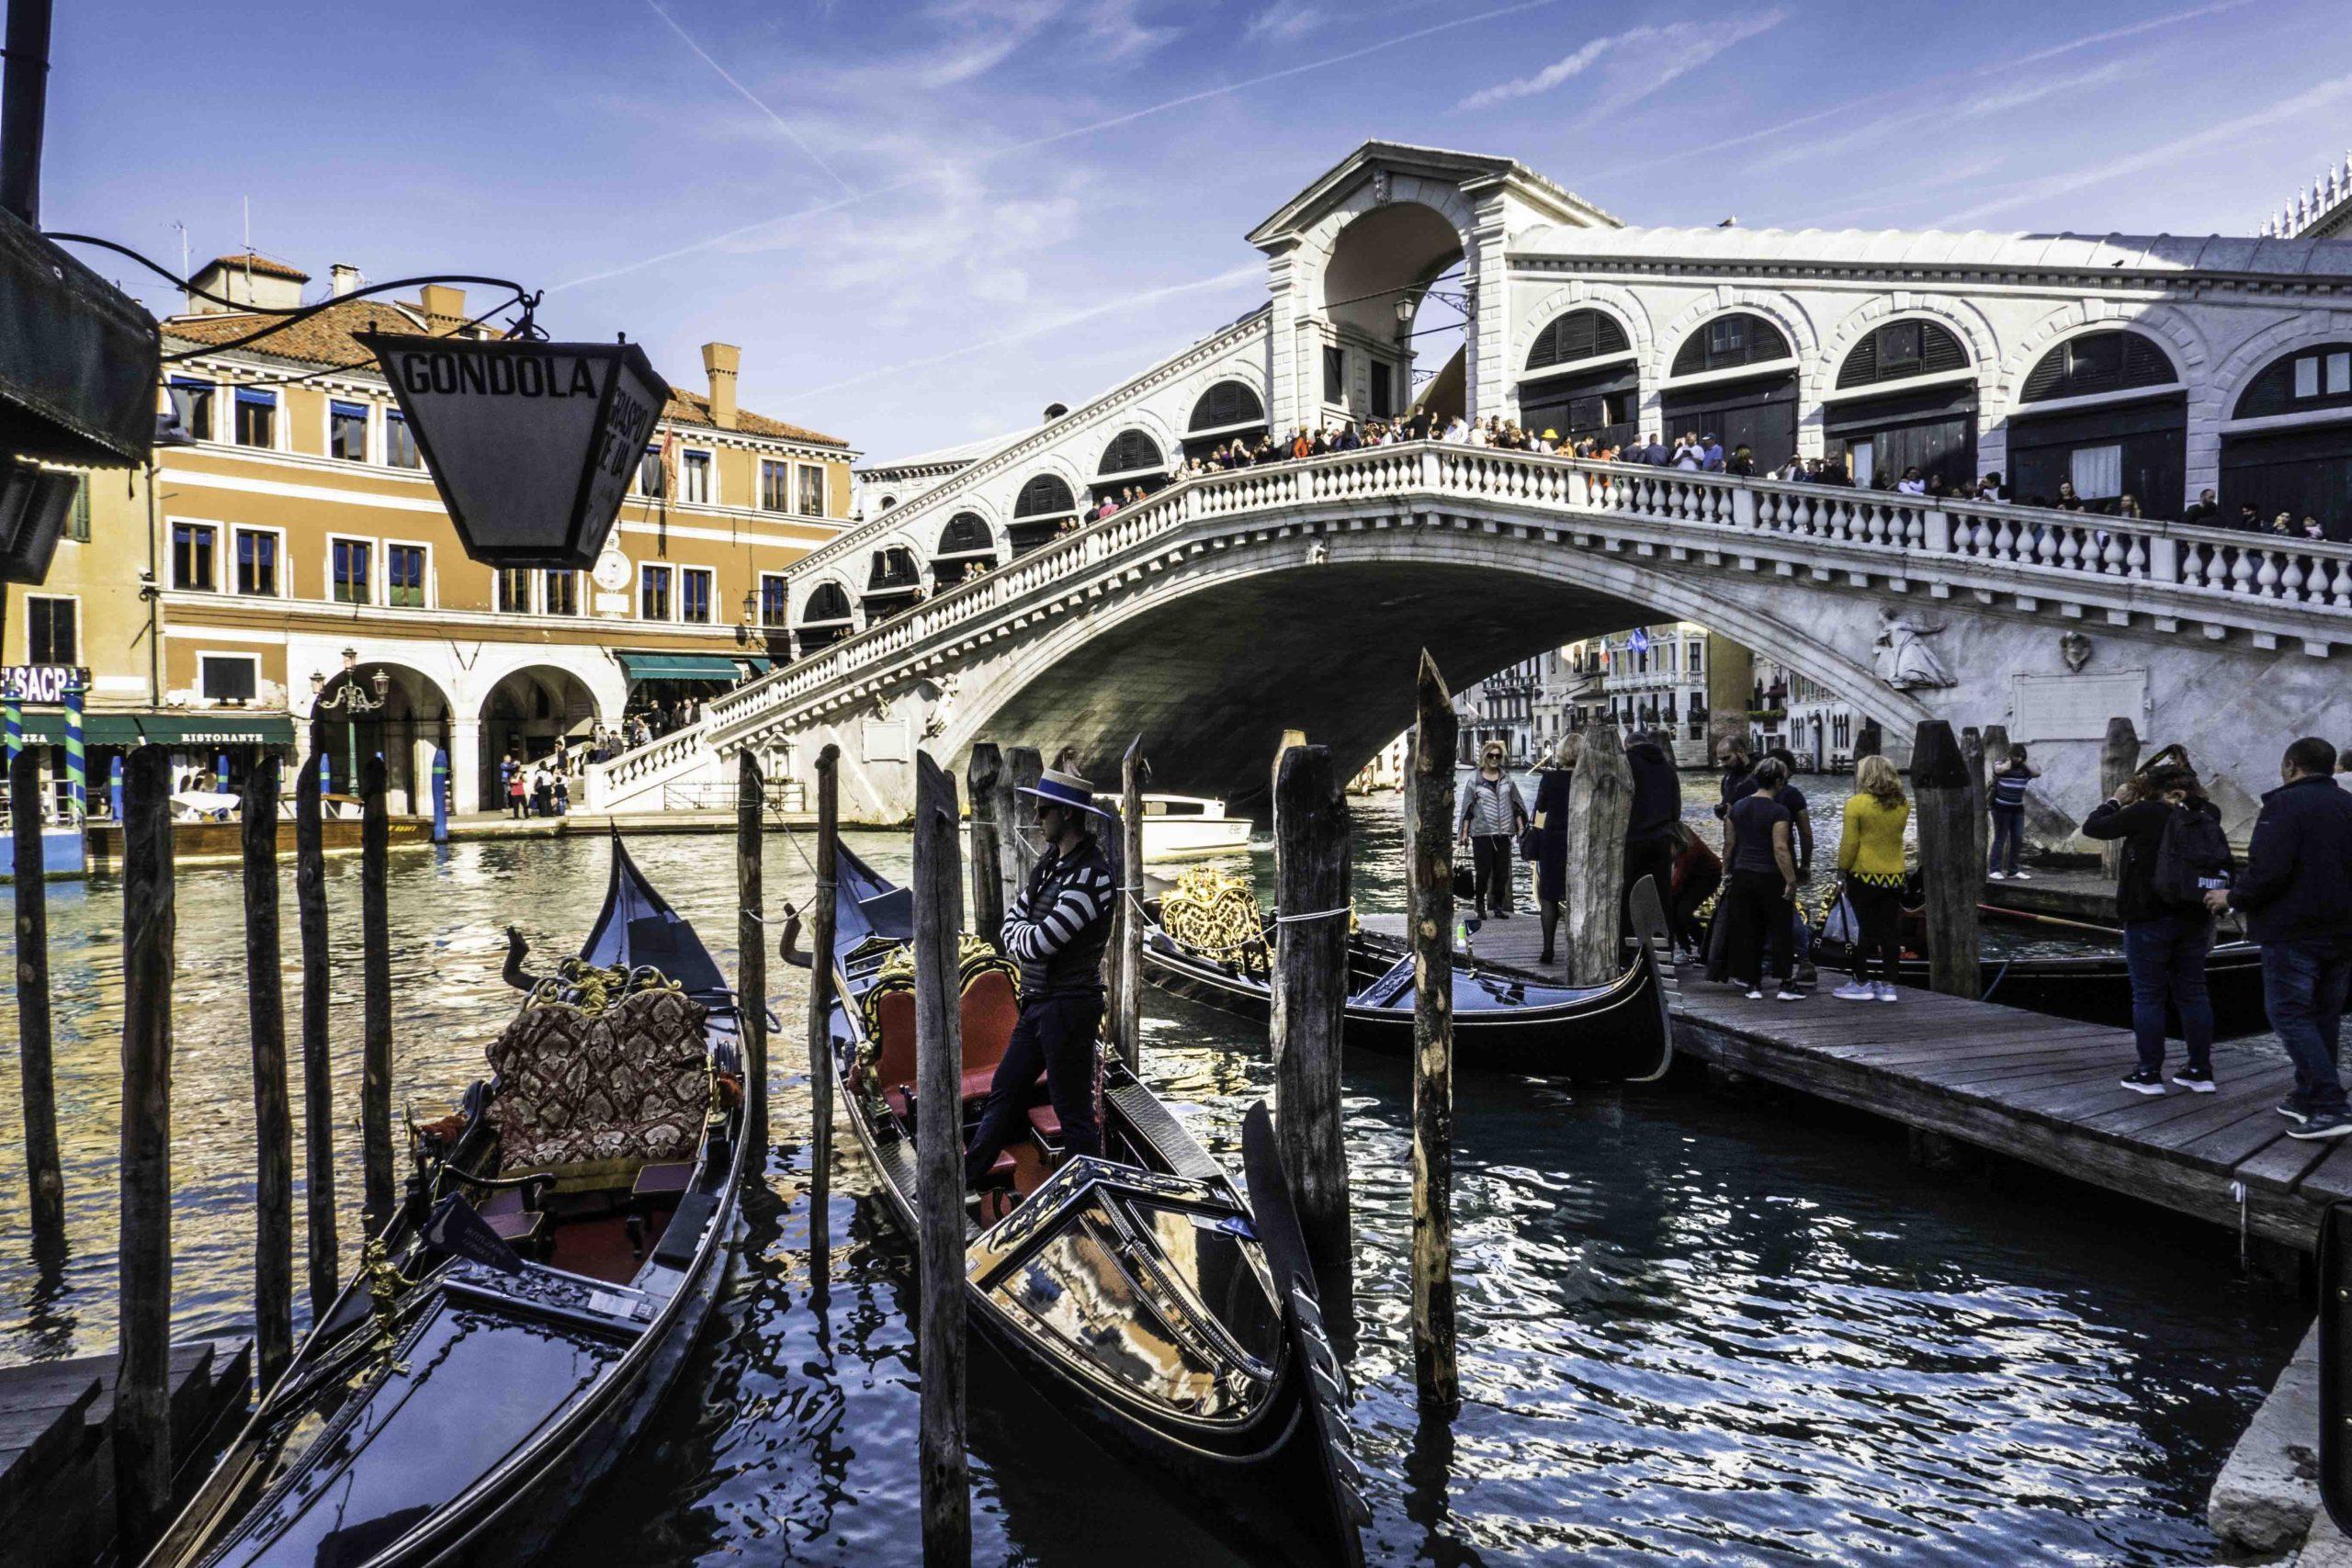 Rialto Bridge, The Grand Canal, Venice, Italy